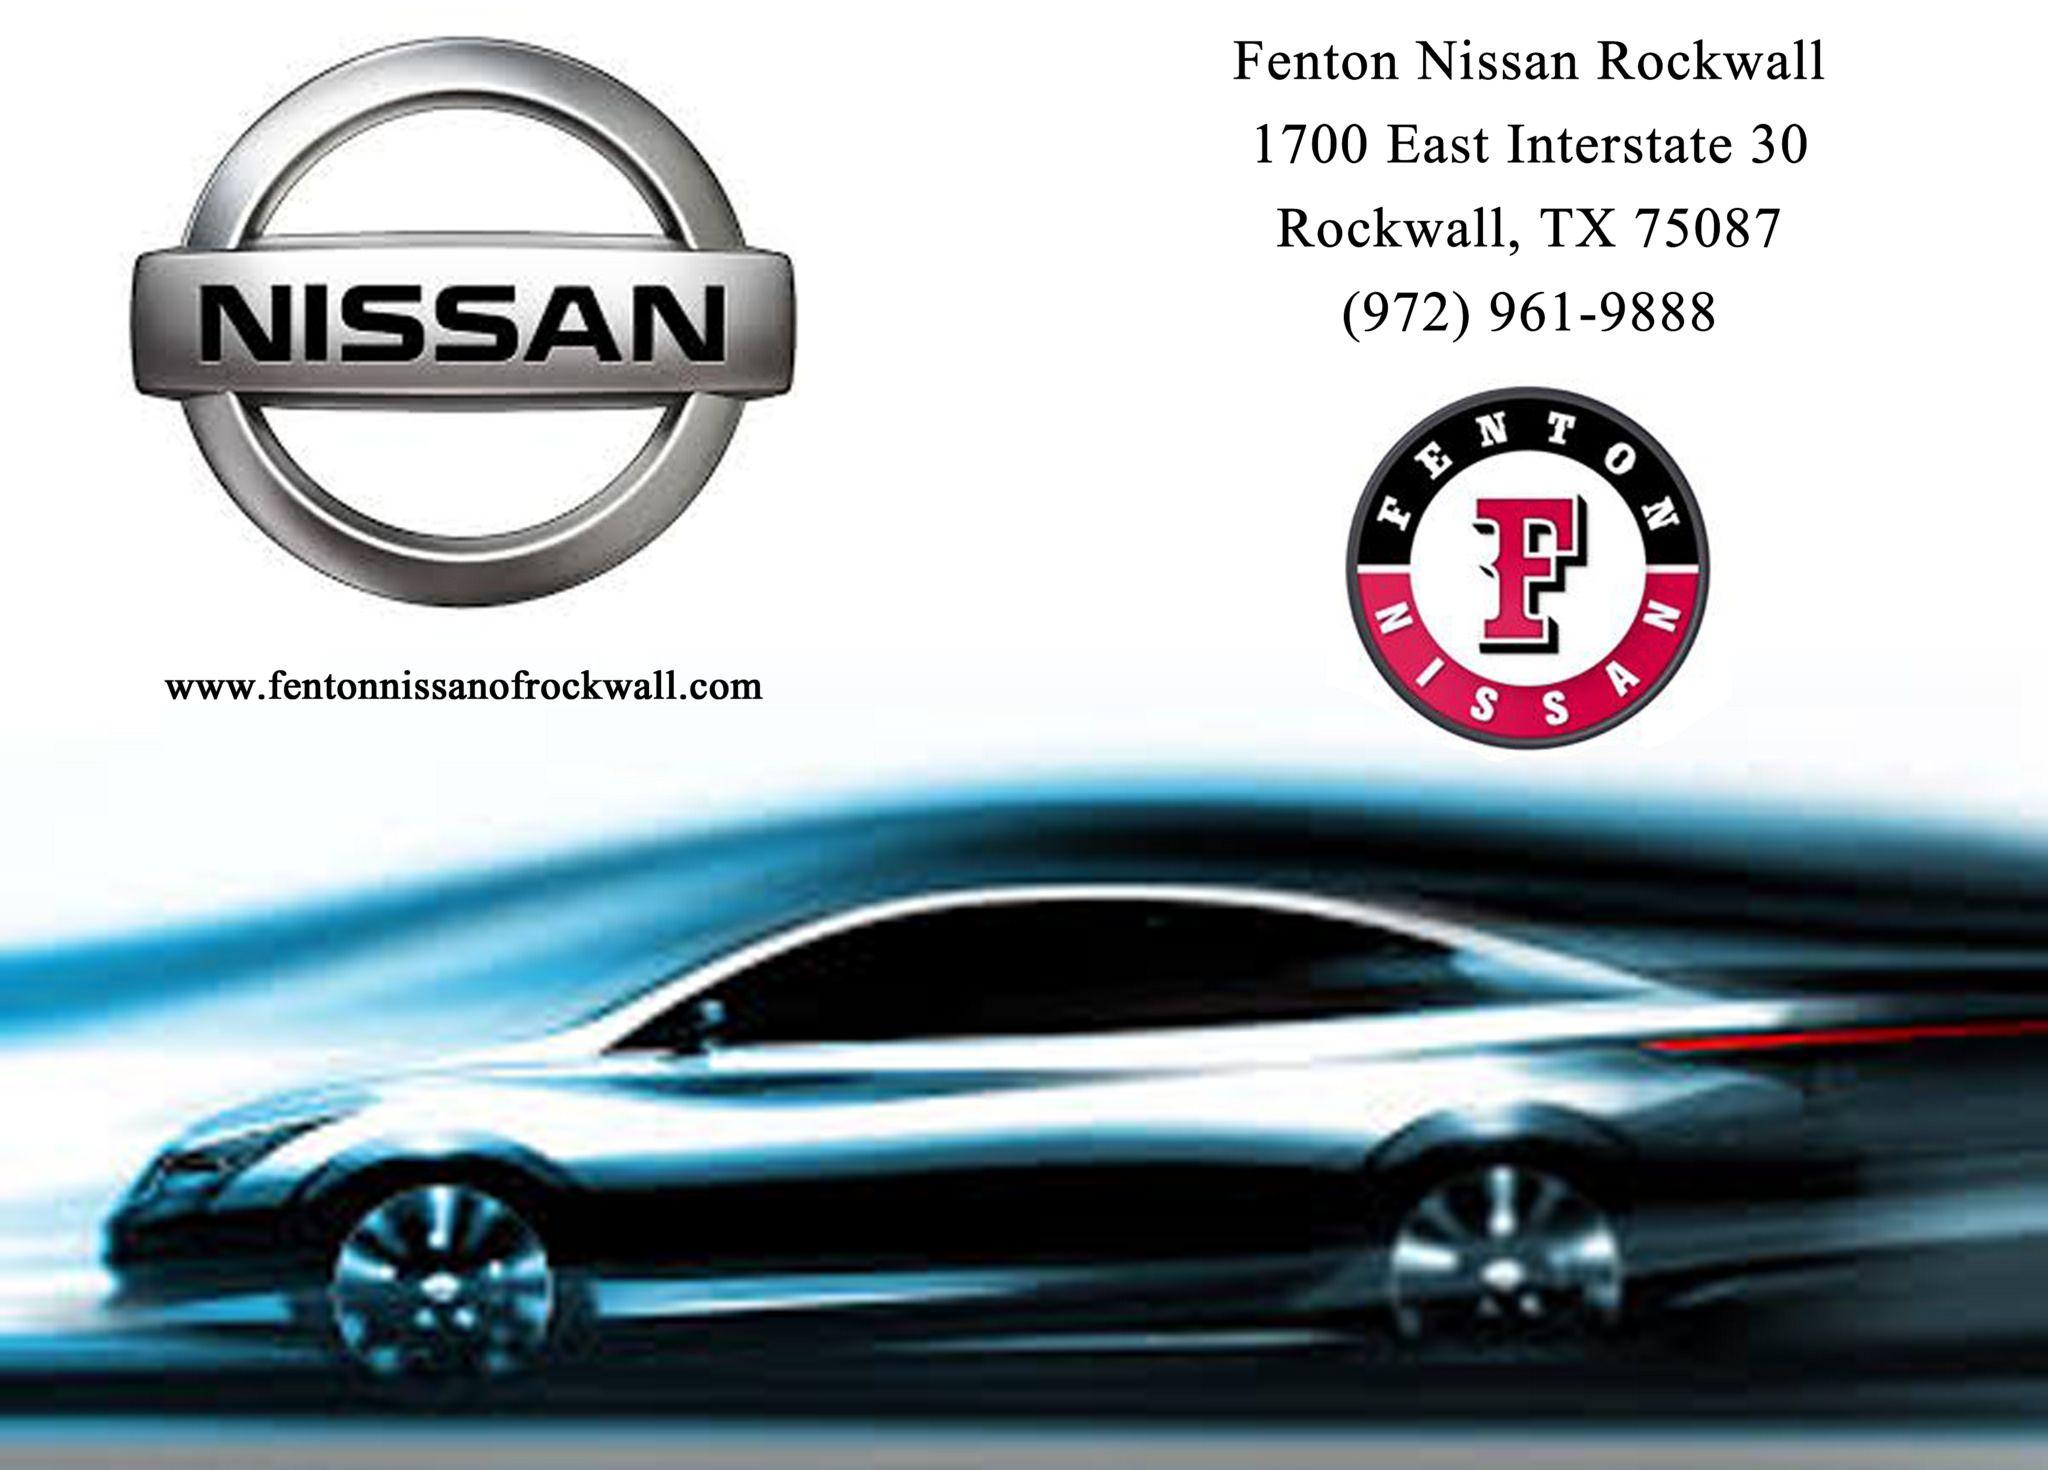 Fenton Nissan East >> Fenton Nissan Of Rockwall Nissan Logos Audi